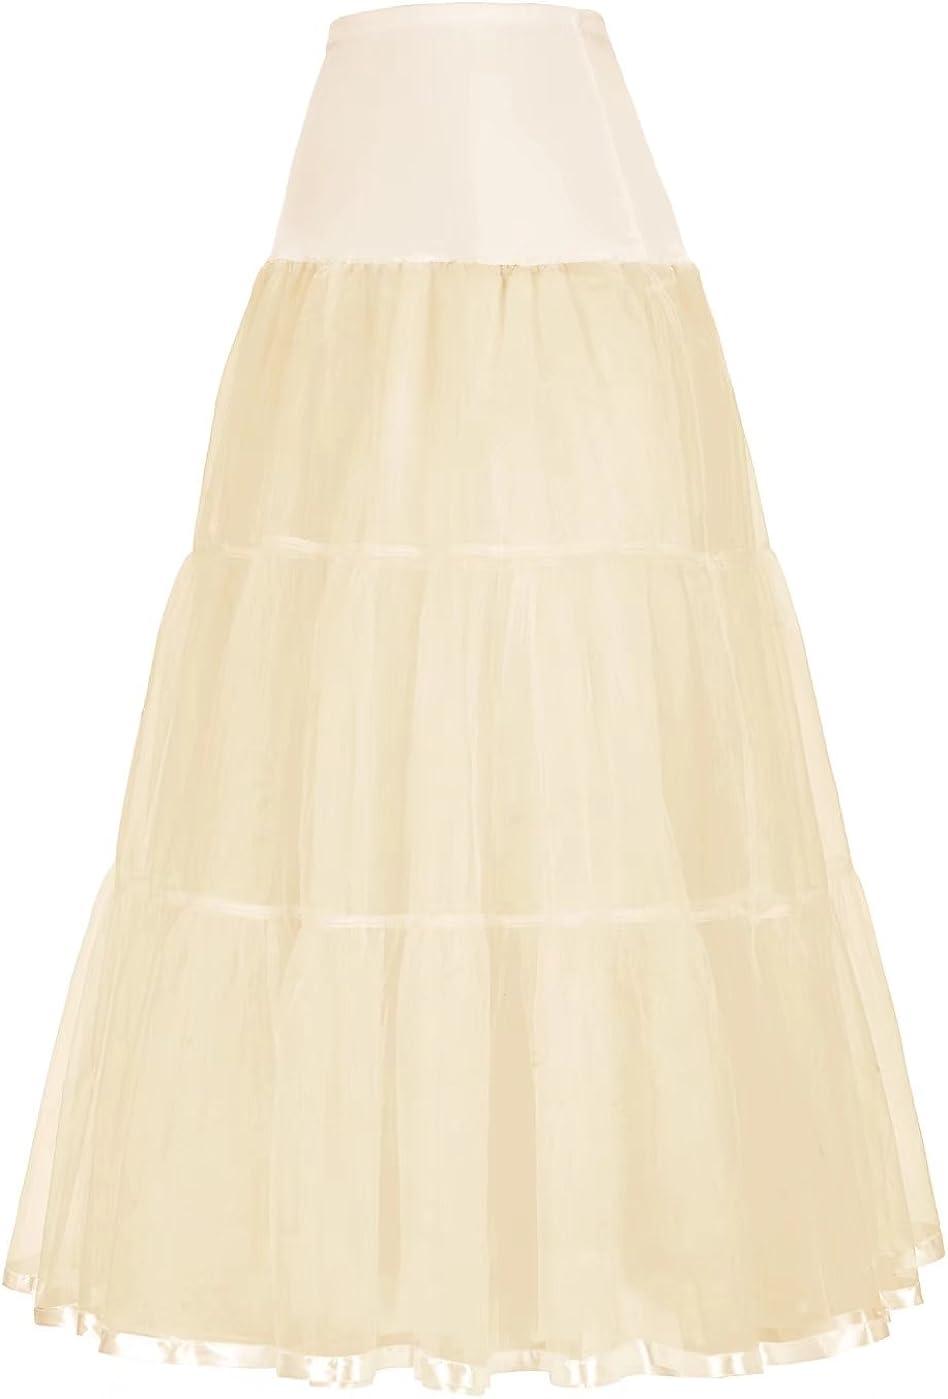 GRACE KARIN Women's Ankle Length Petticoats Wedding Slips Plus Size S-3X